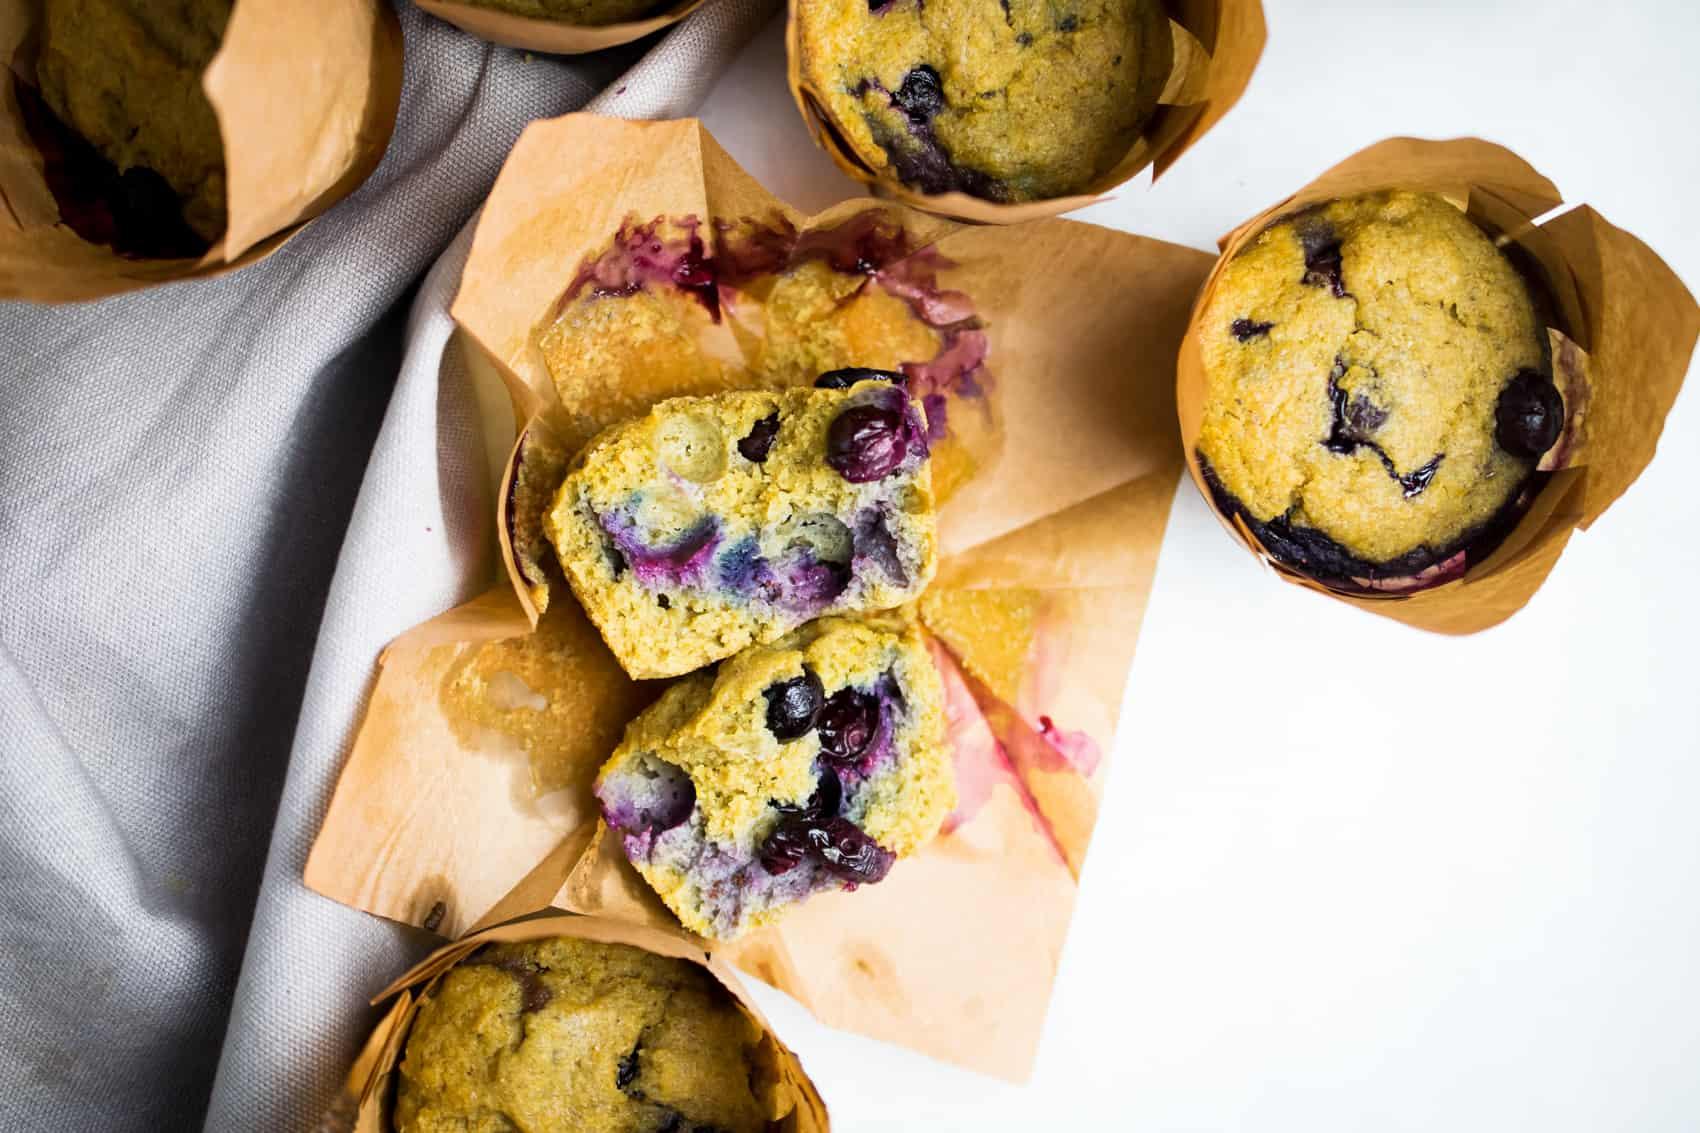 Coconut Flour Blueberry Muffins (paleo, keto, dairy free